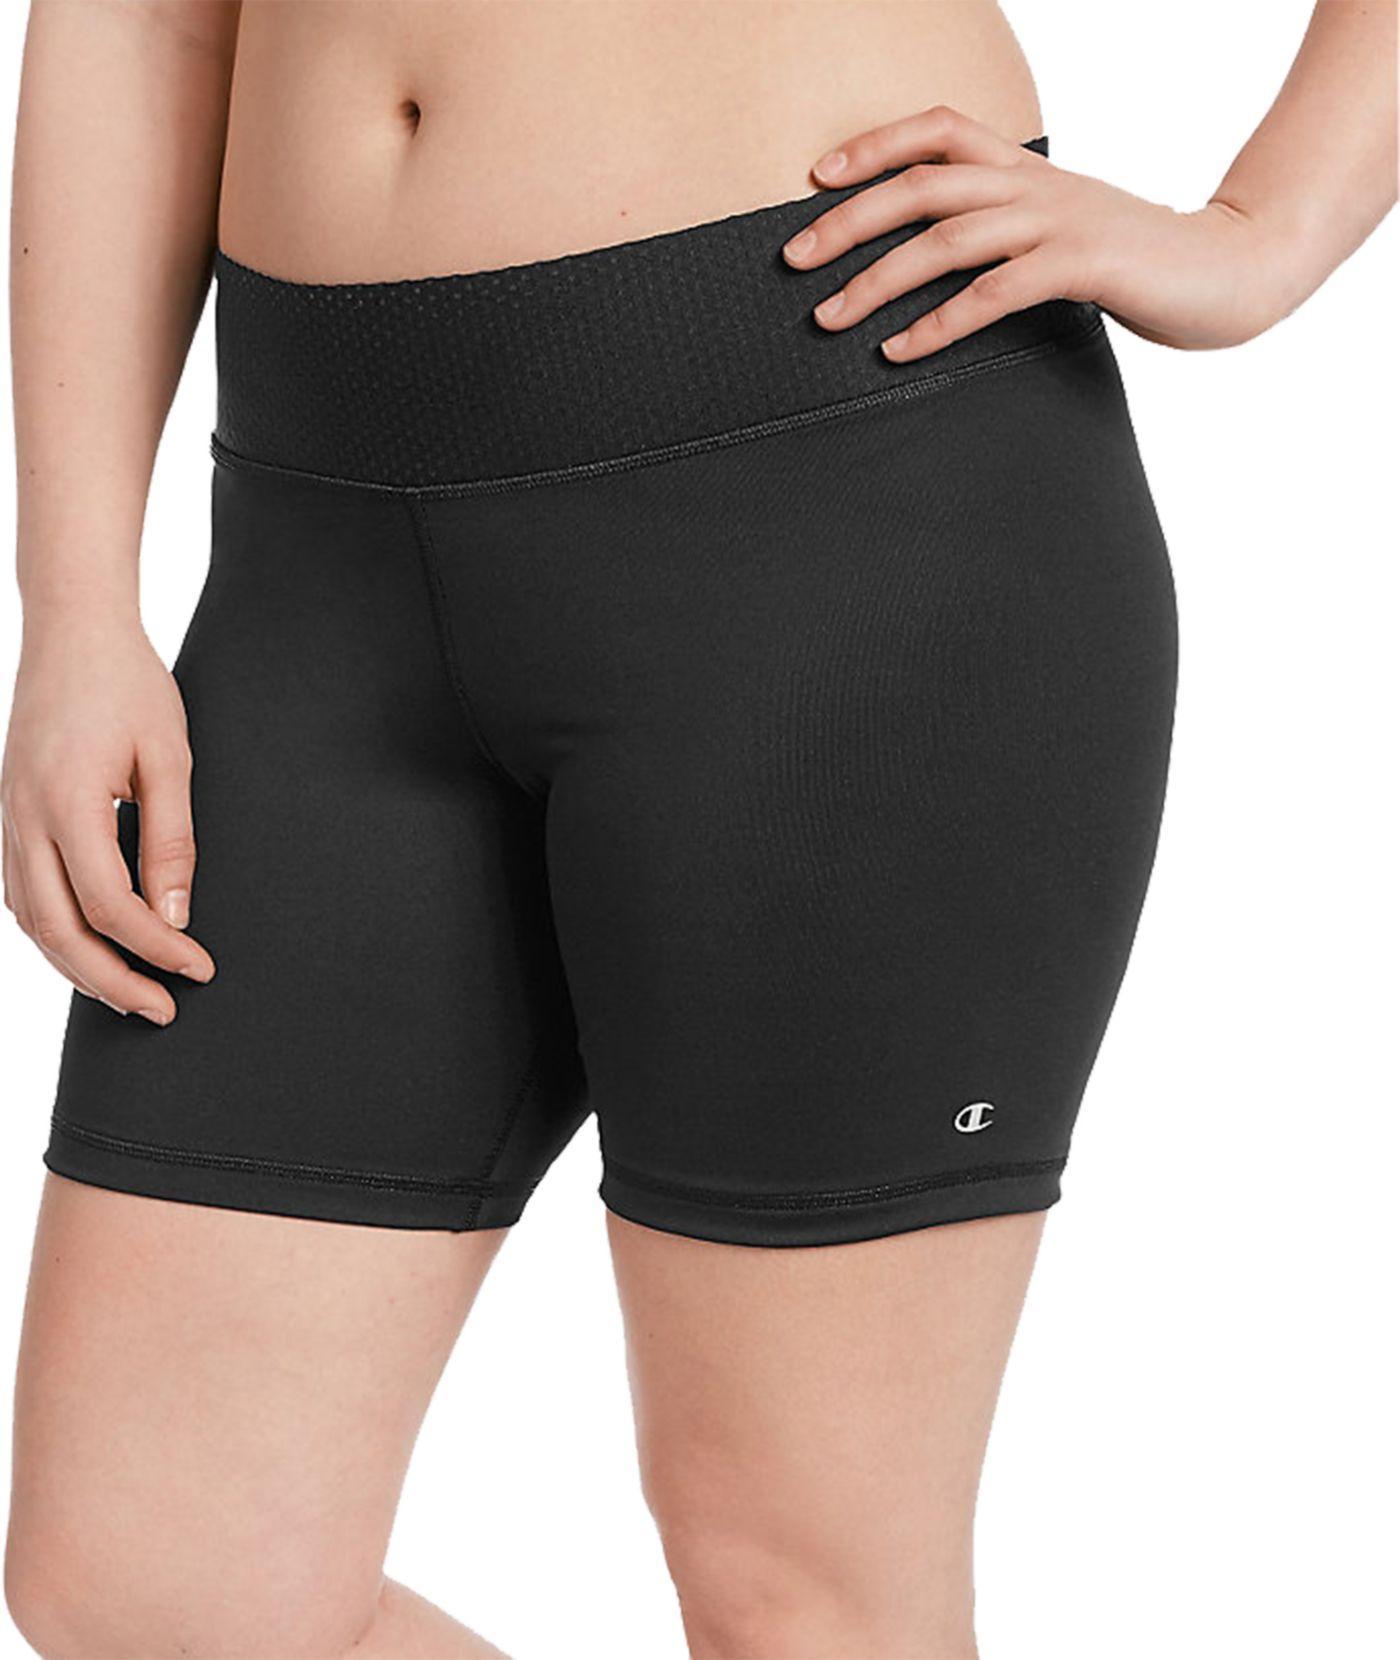 Champion Women's Plus Size Absolute Shorts